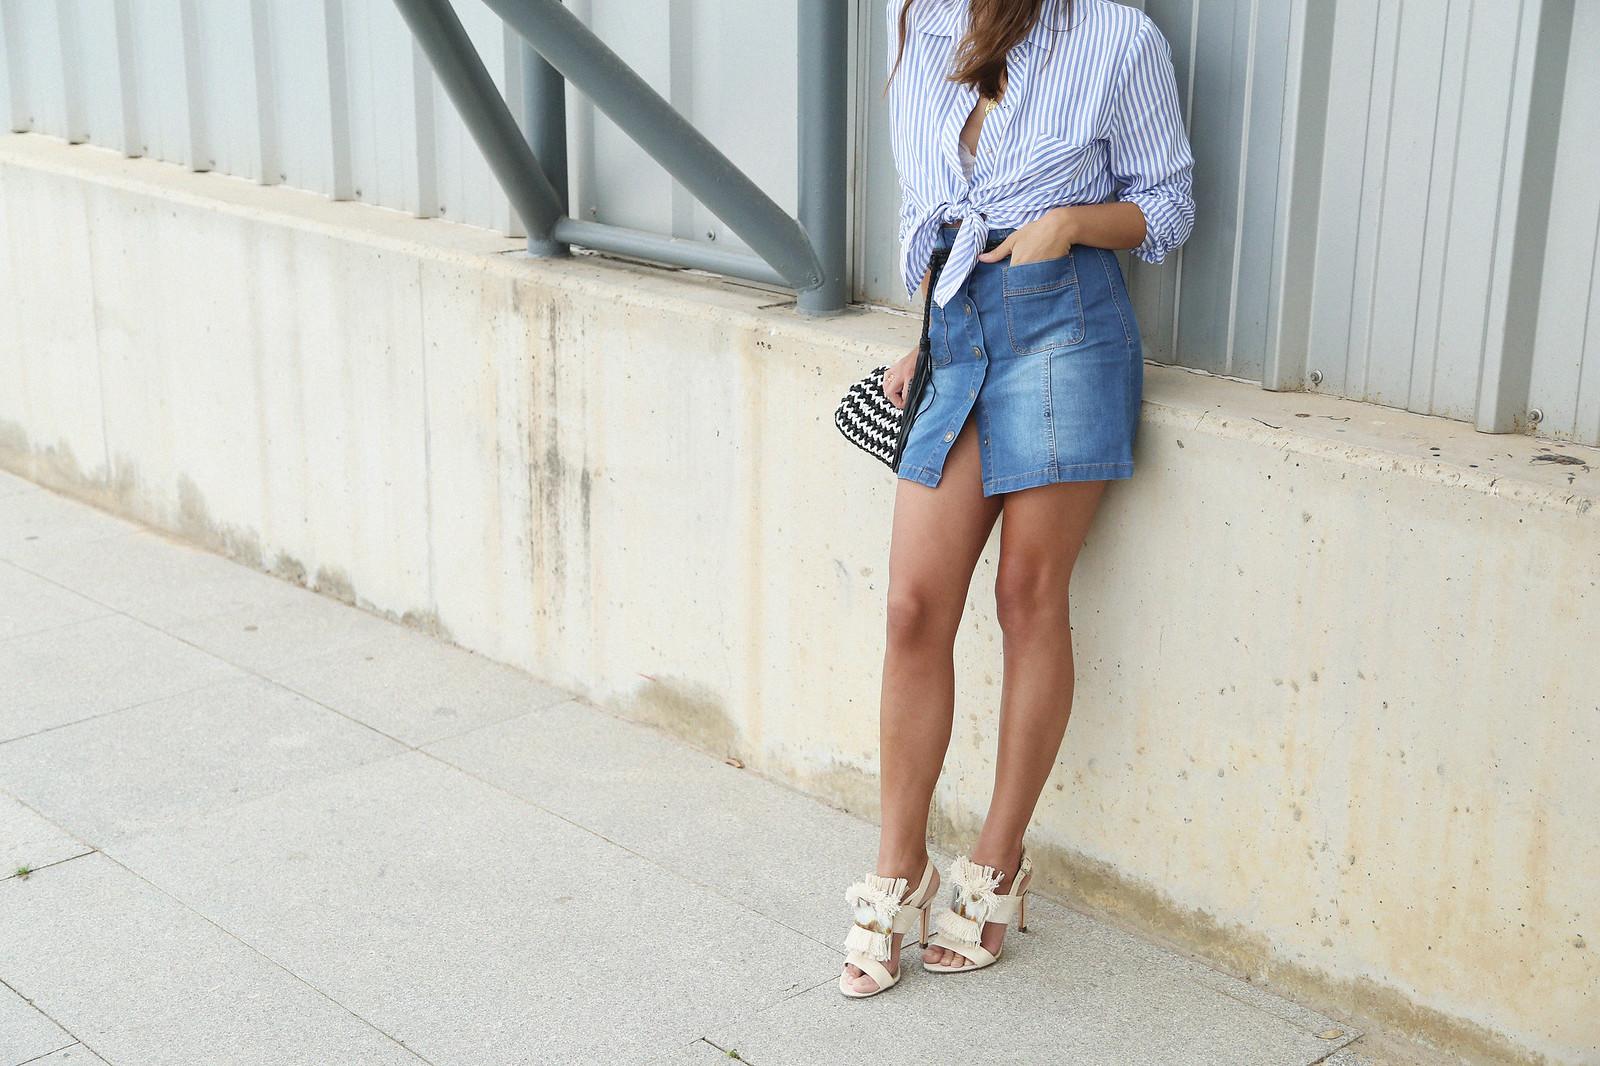 jessie chanes seams for a desire denim skirt stripes shirt-5